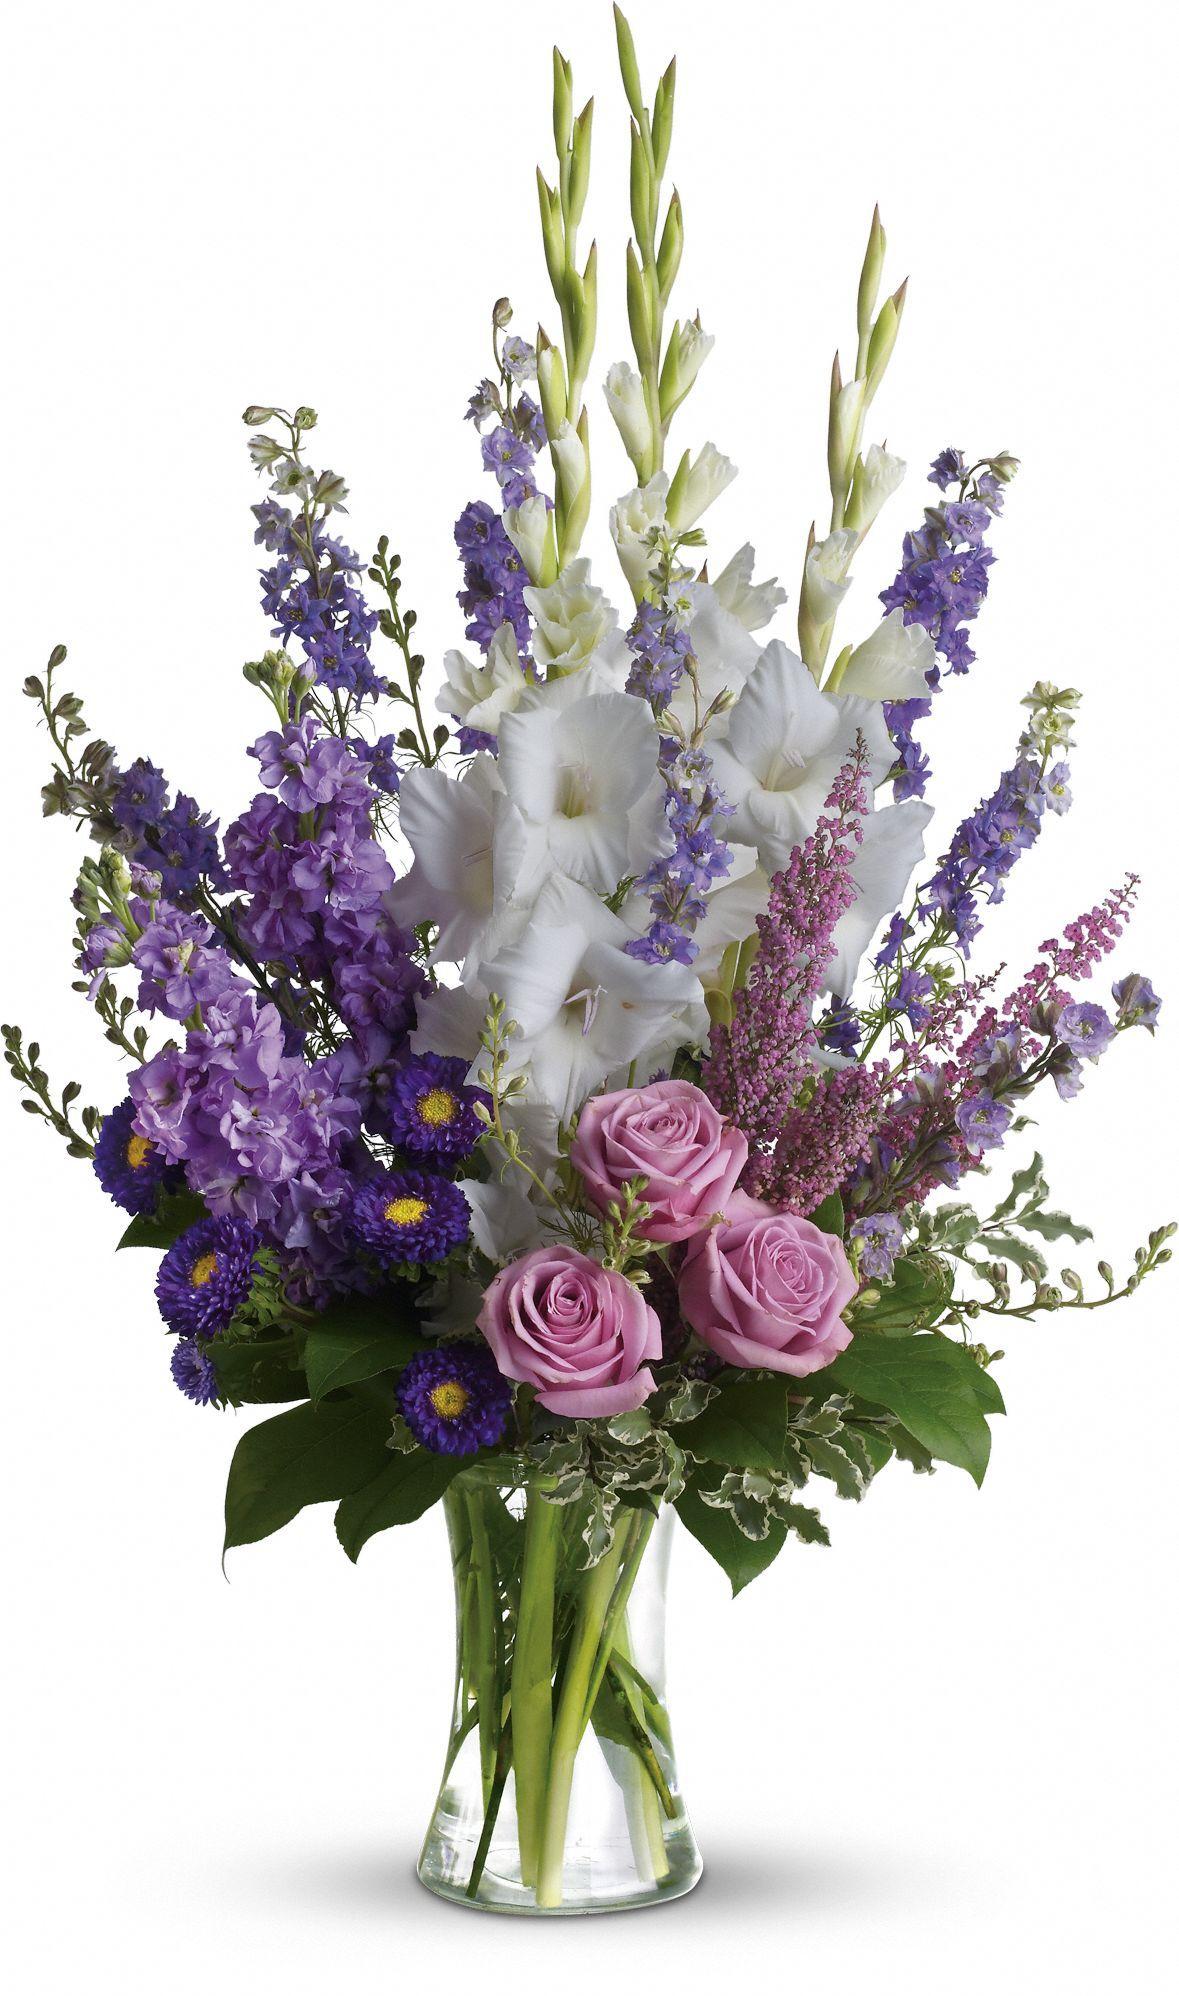 Joyful Memory Calparty Funeral Flowers Flower